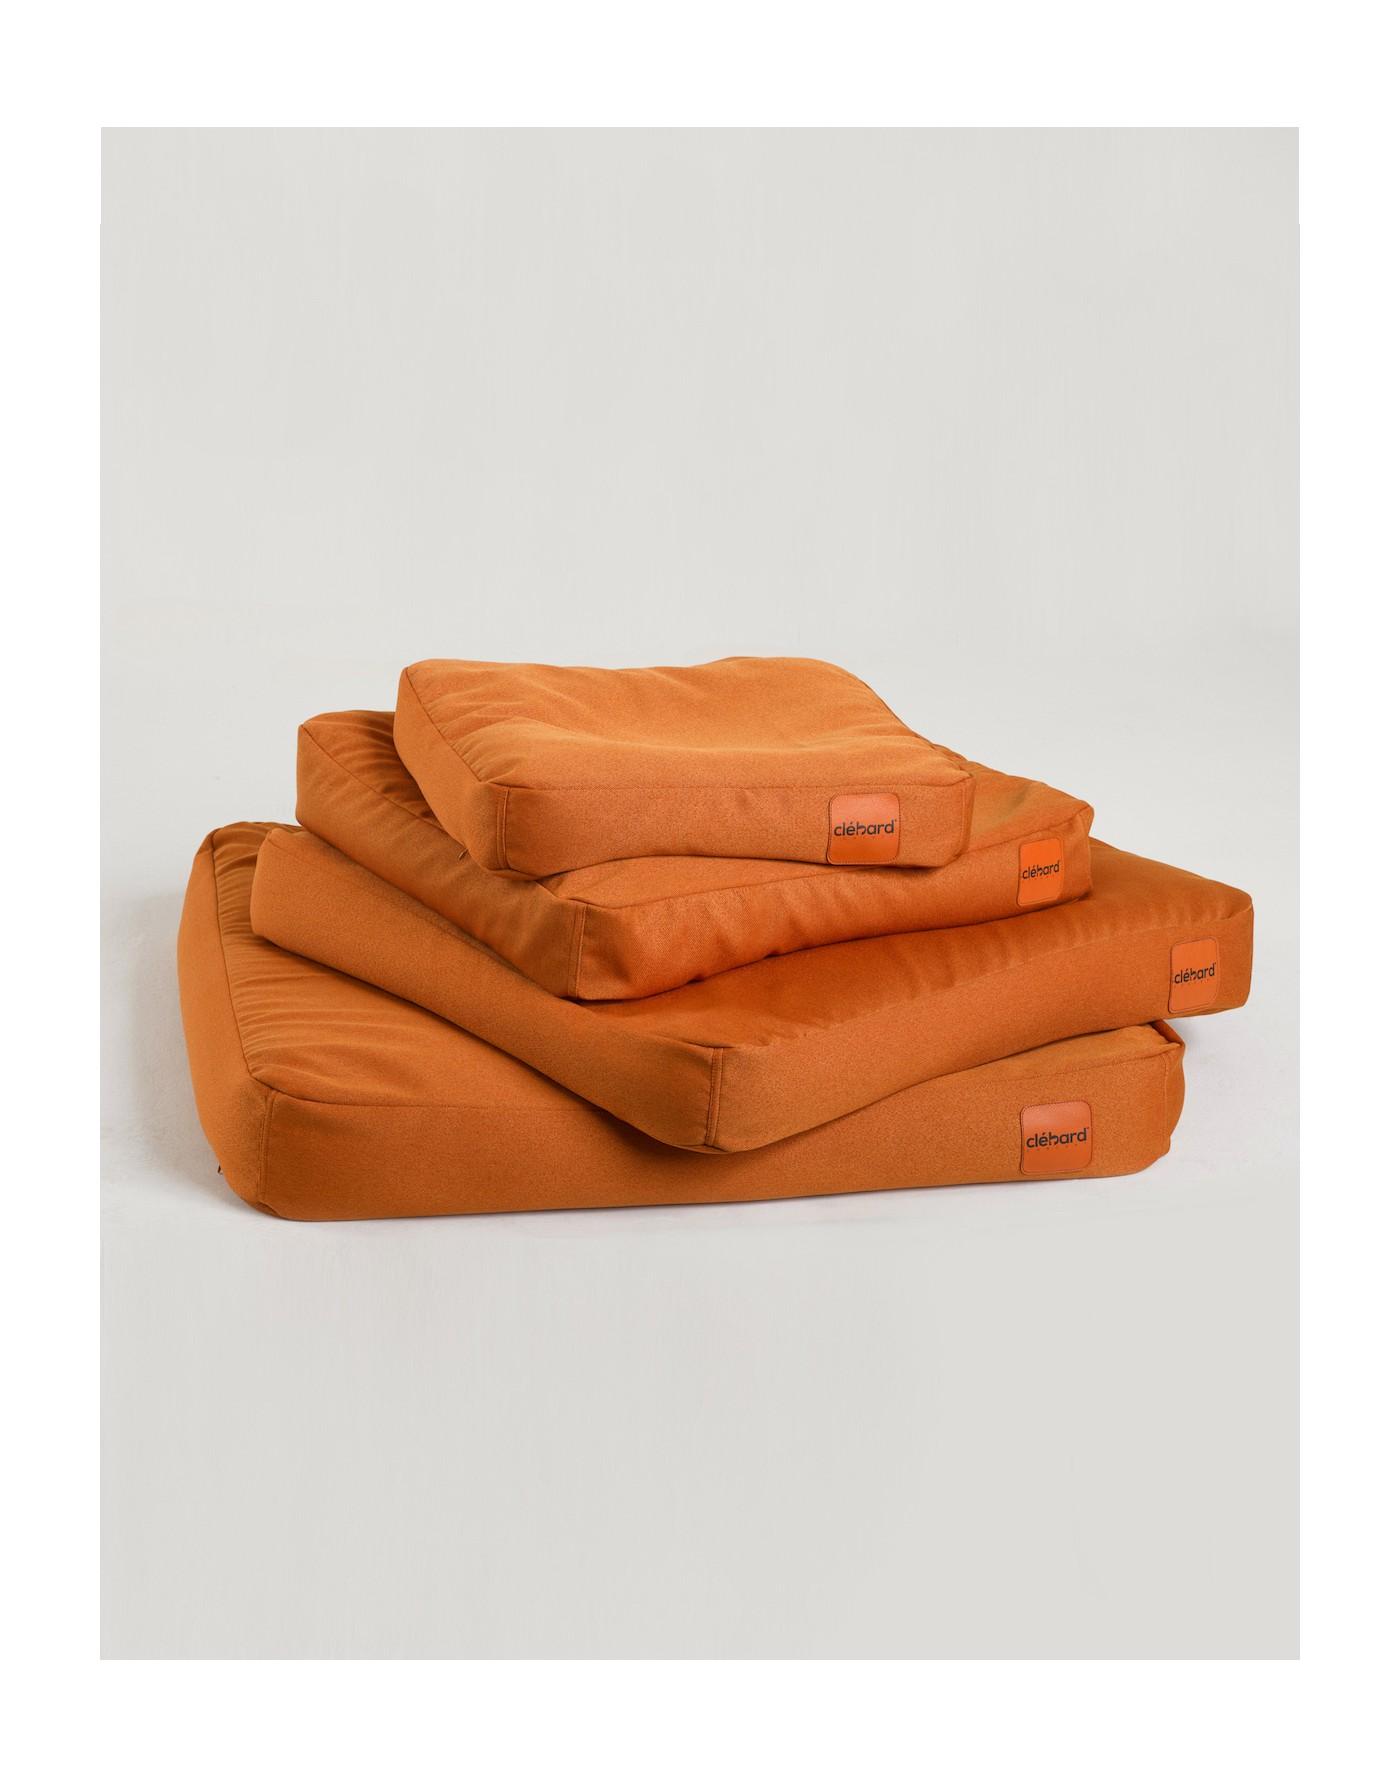 dog s cushion design sofa orange